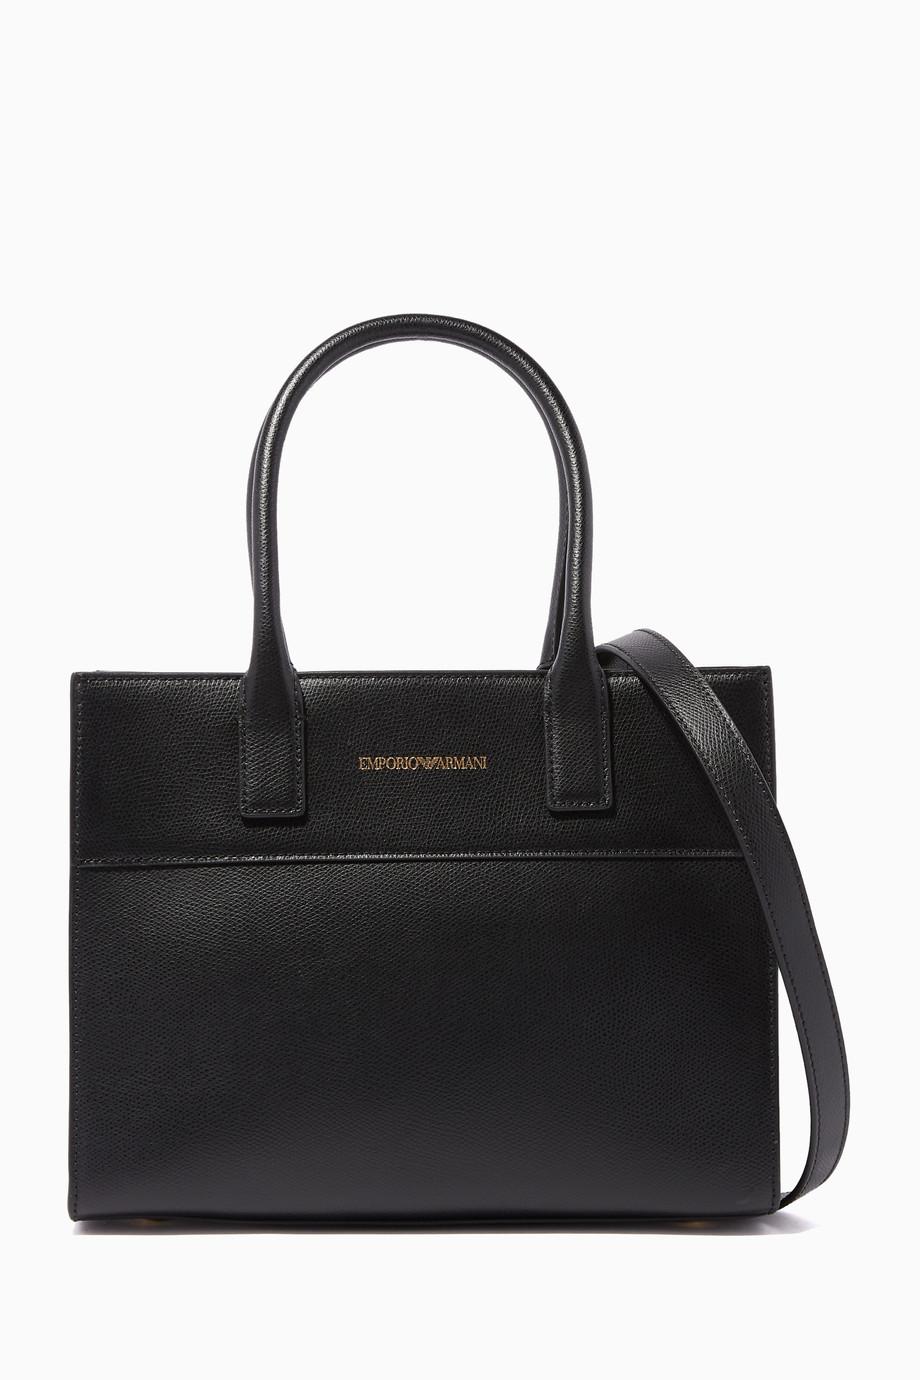 eb47bad77 تسوق Black Structured Shopper Bag امبوريو ارماني أسود للنساء   اُناس